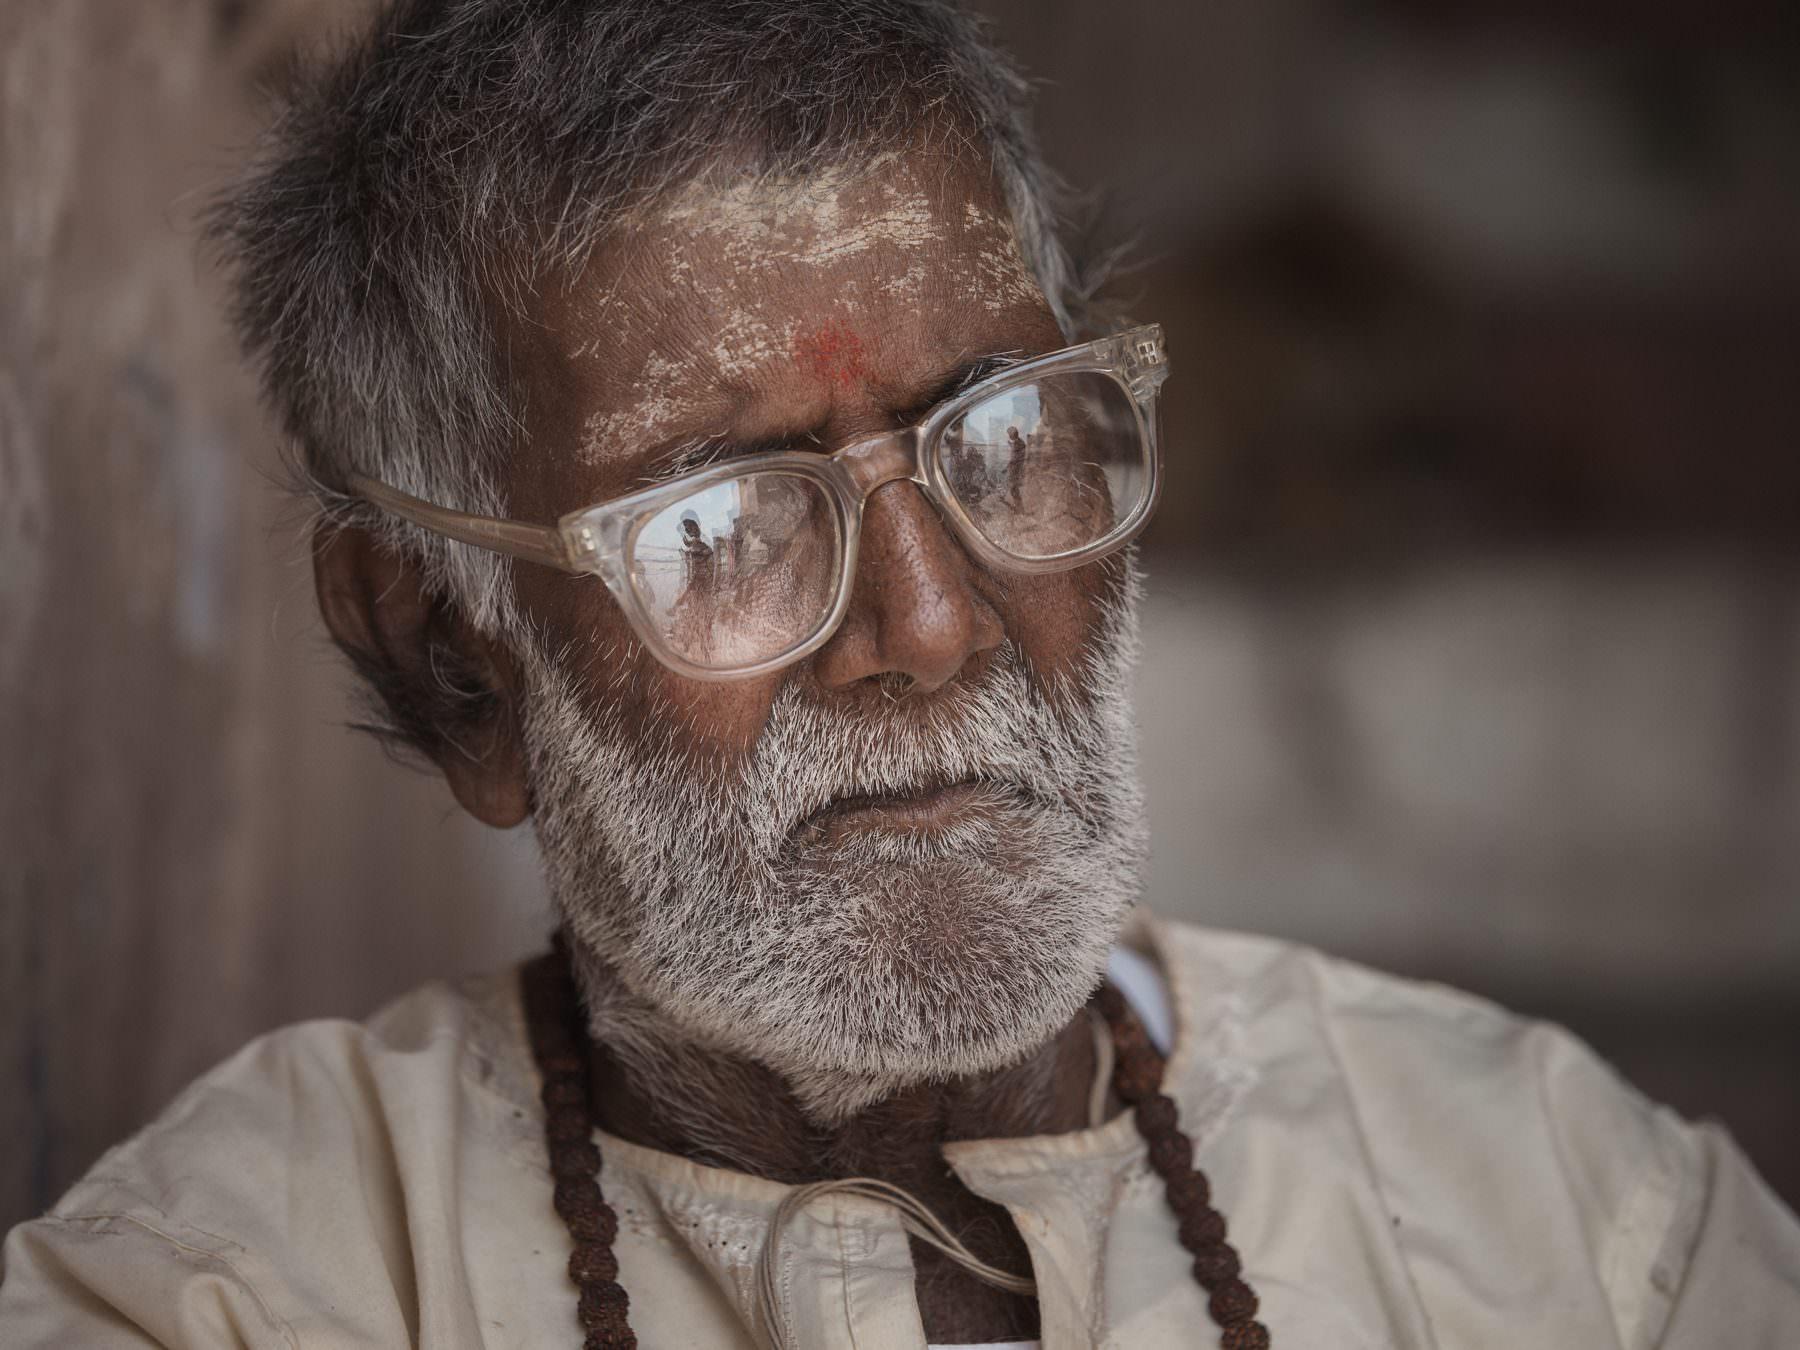 Faces of Varanasi: Old Brahmin is watching a Kite Runner, India, Varanasi, Ganga